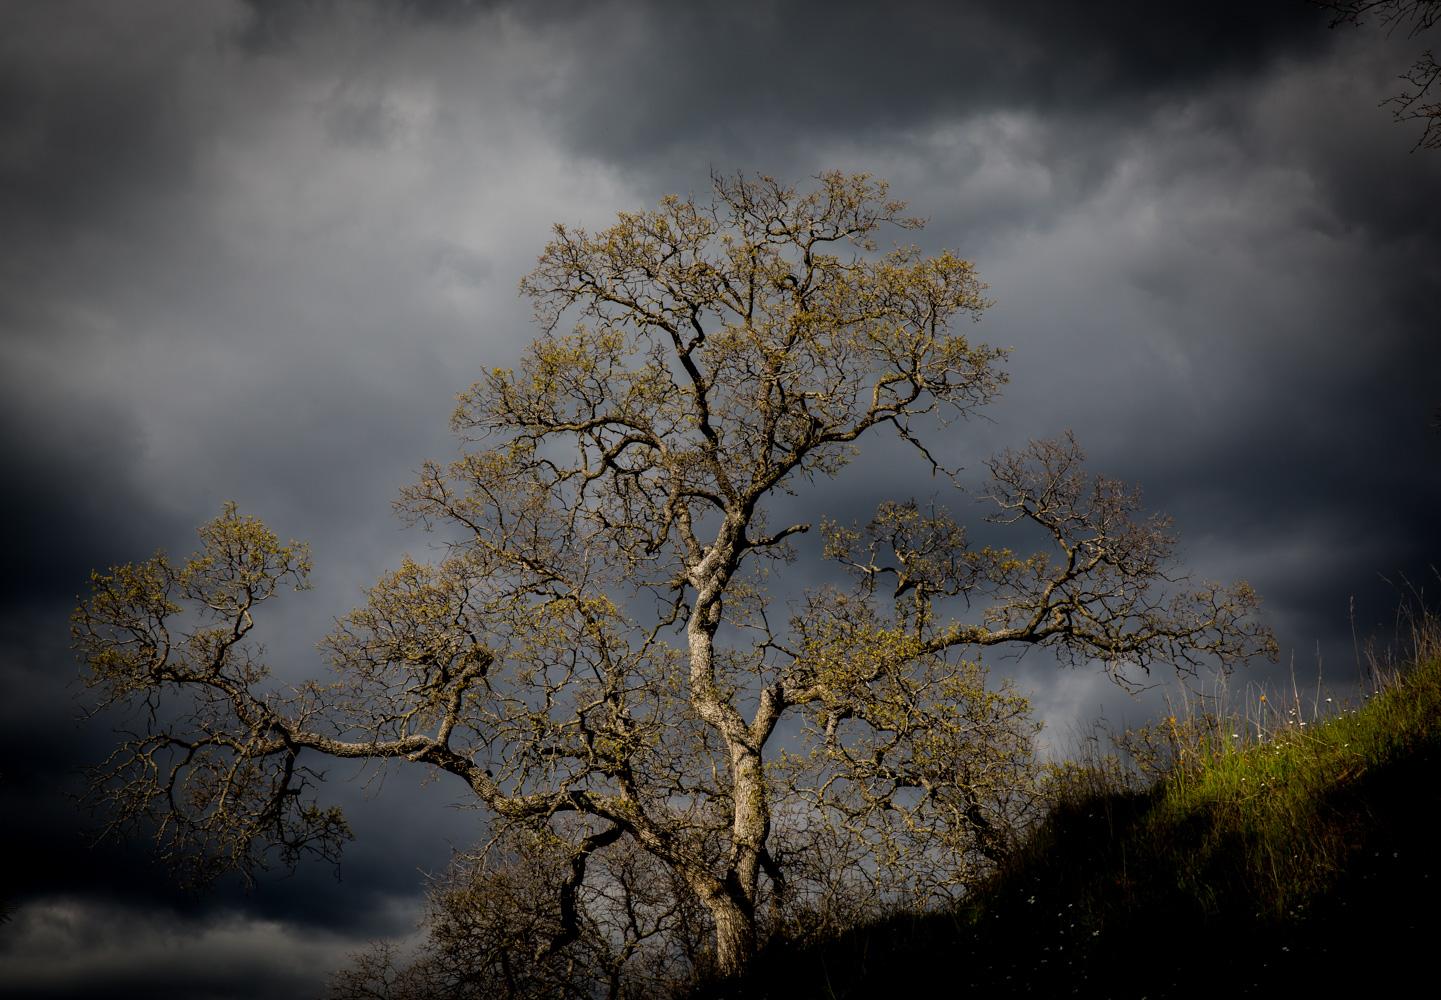 redrock2011作品:三月春暖